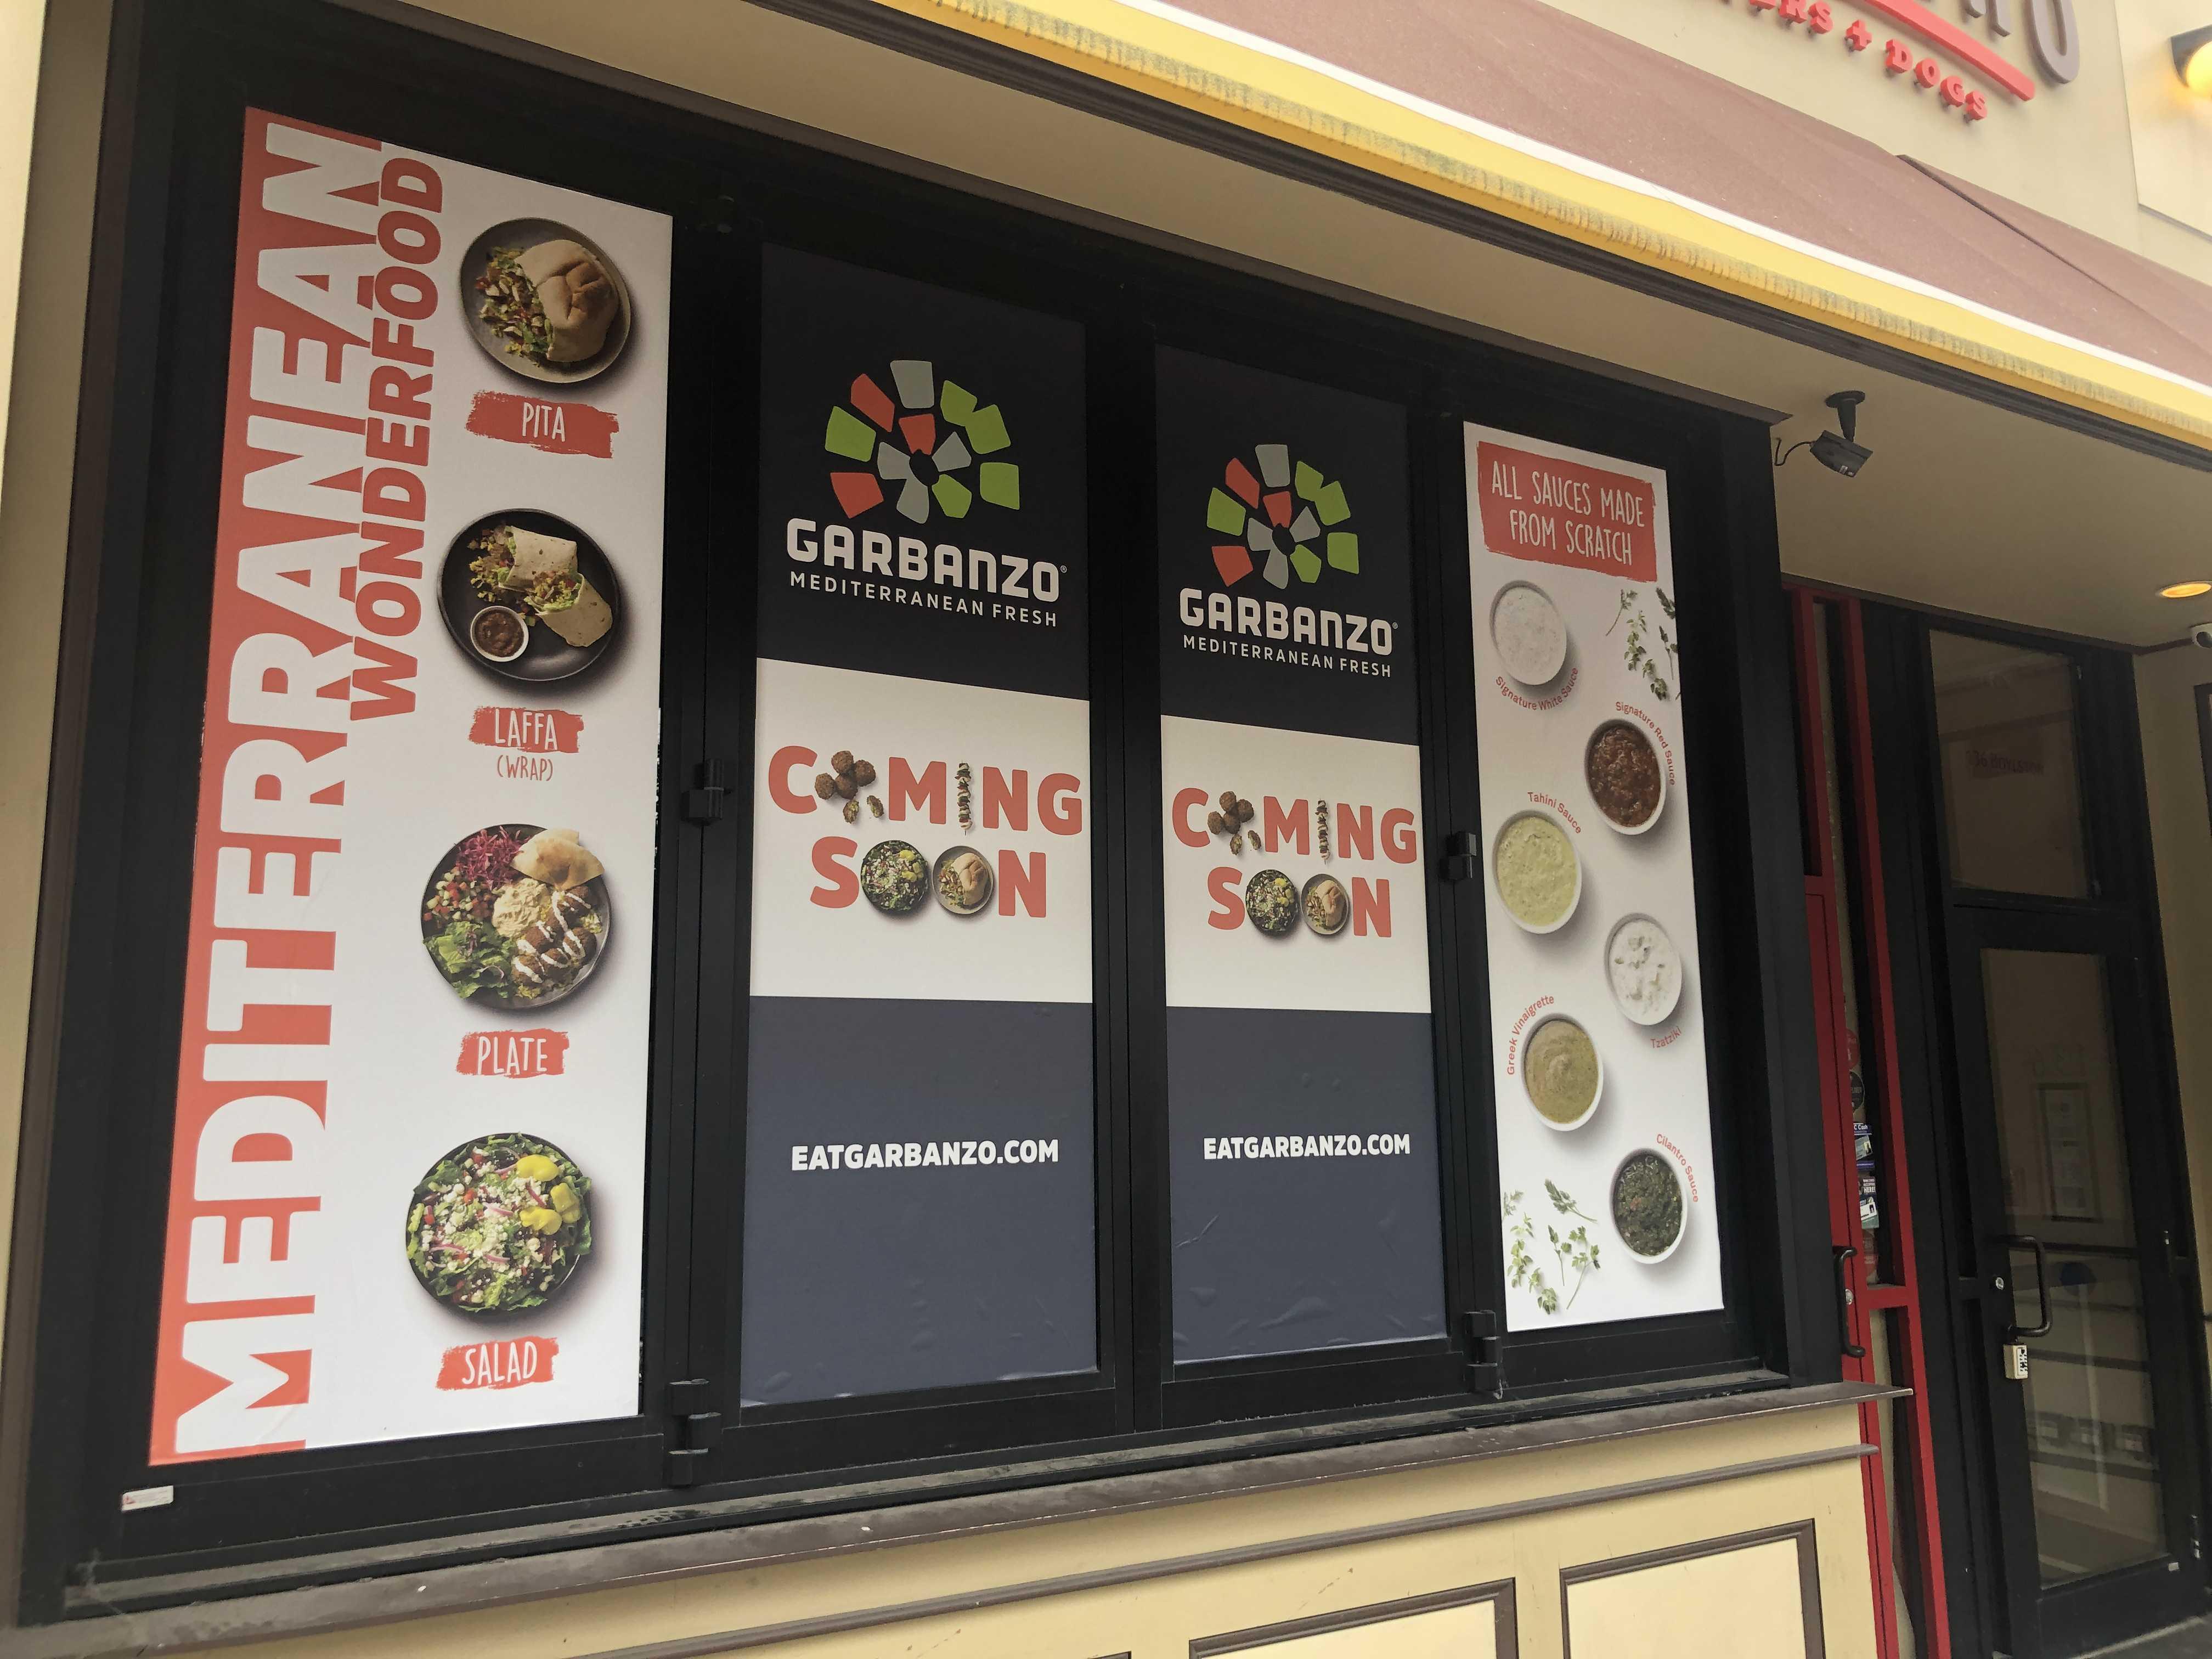 Mediterranean restaurant Garbanzo is scheduled to open in January. Stephanie Purifoy / Beacon Staff